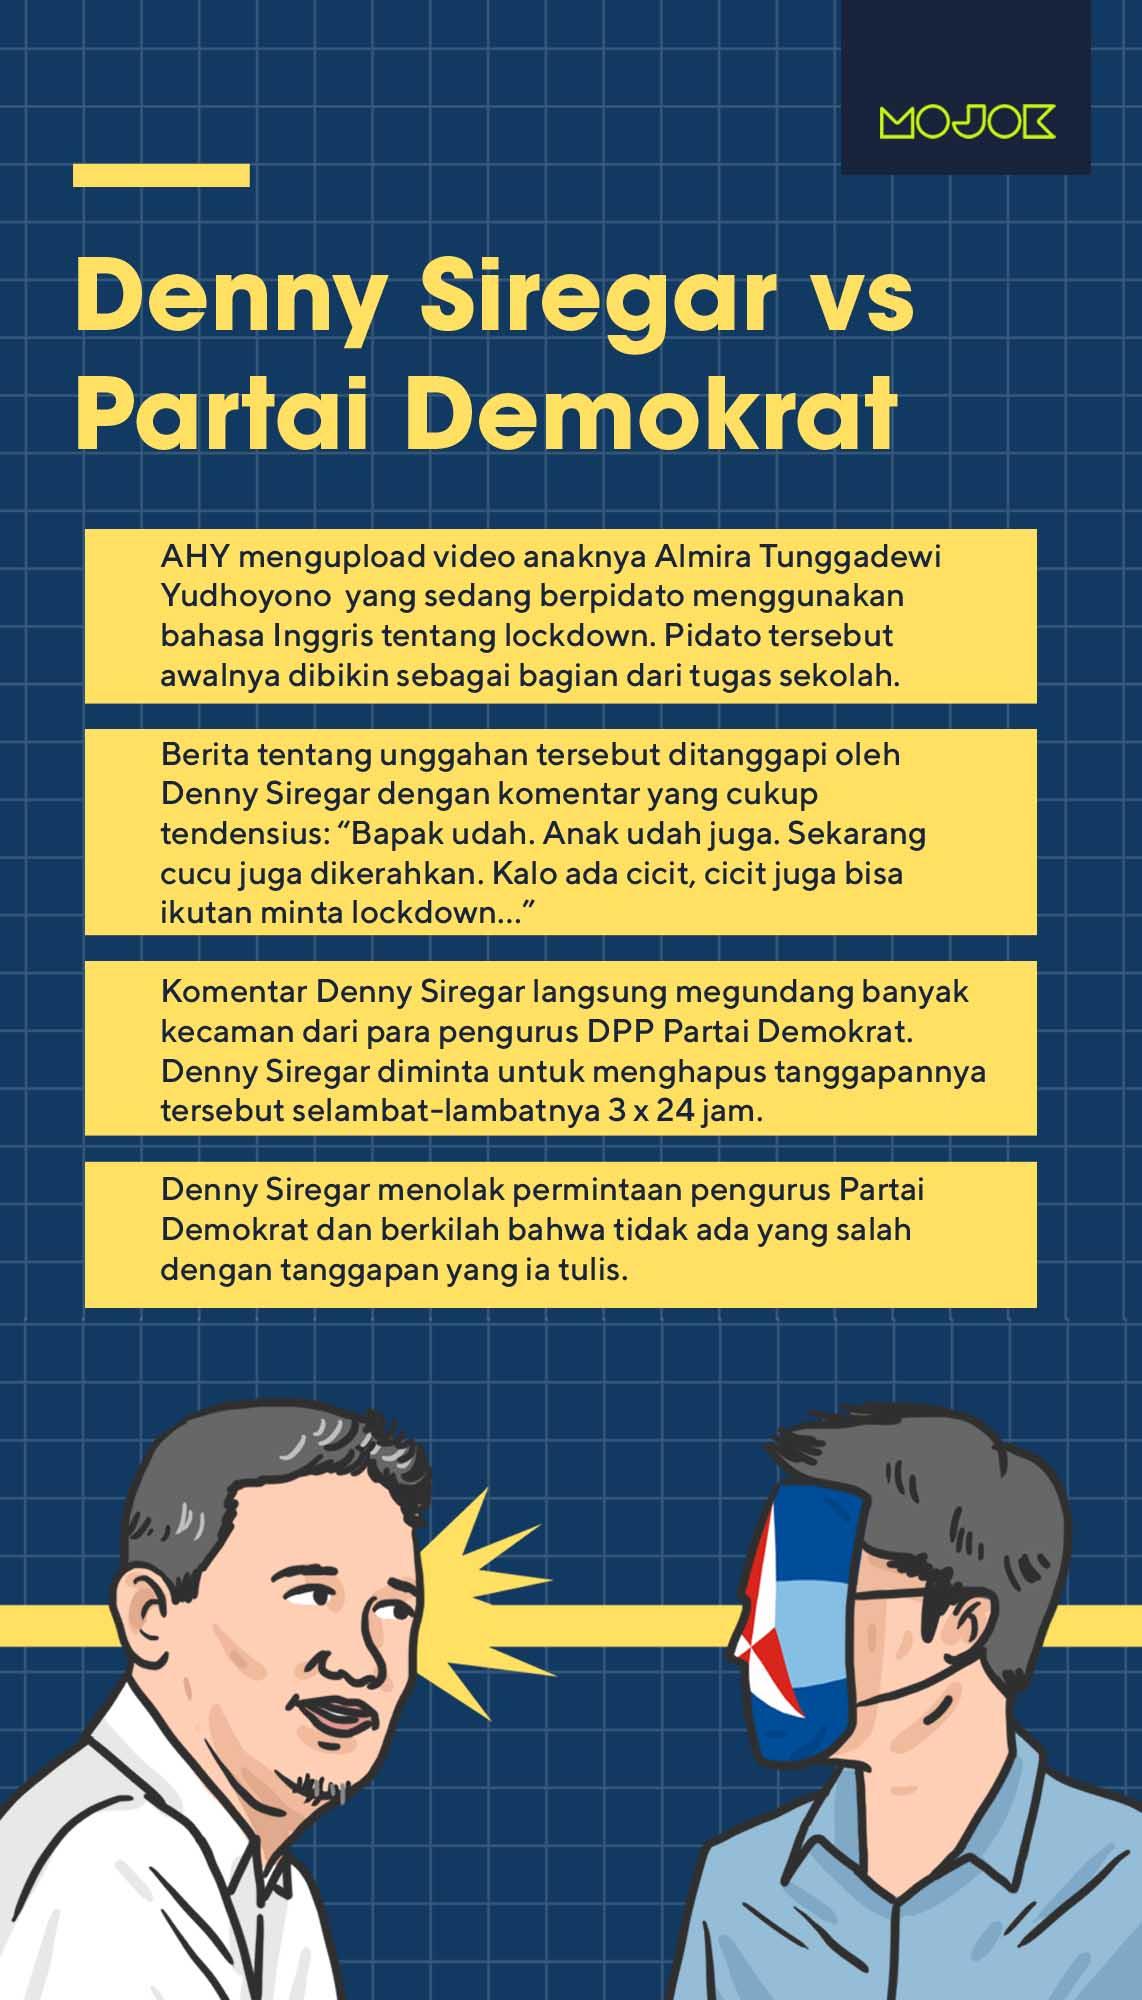 denny siregar, SBY, demokrat mojok.co